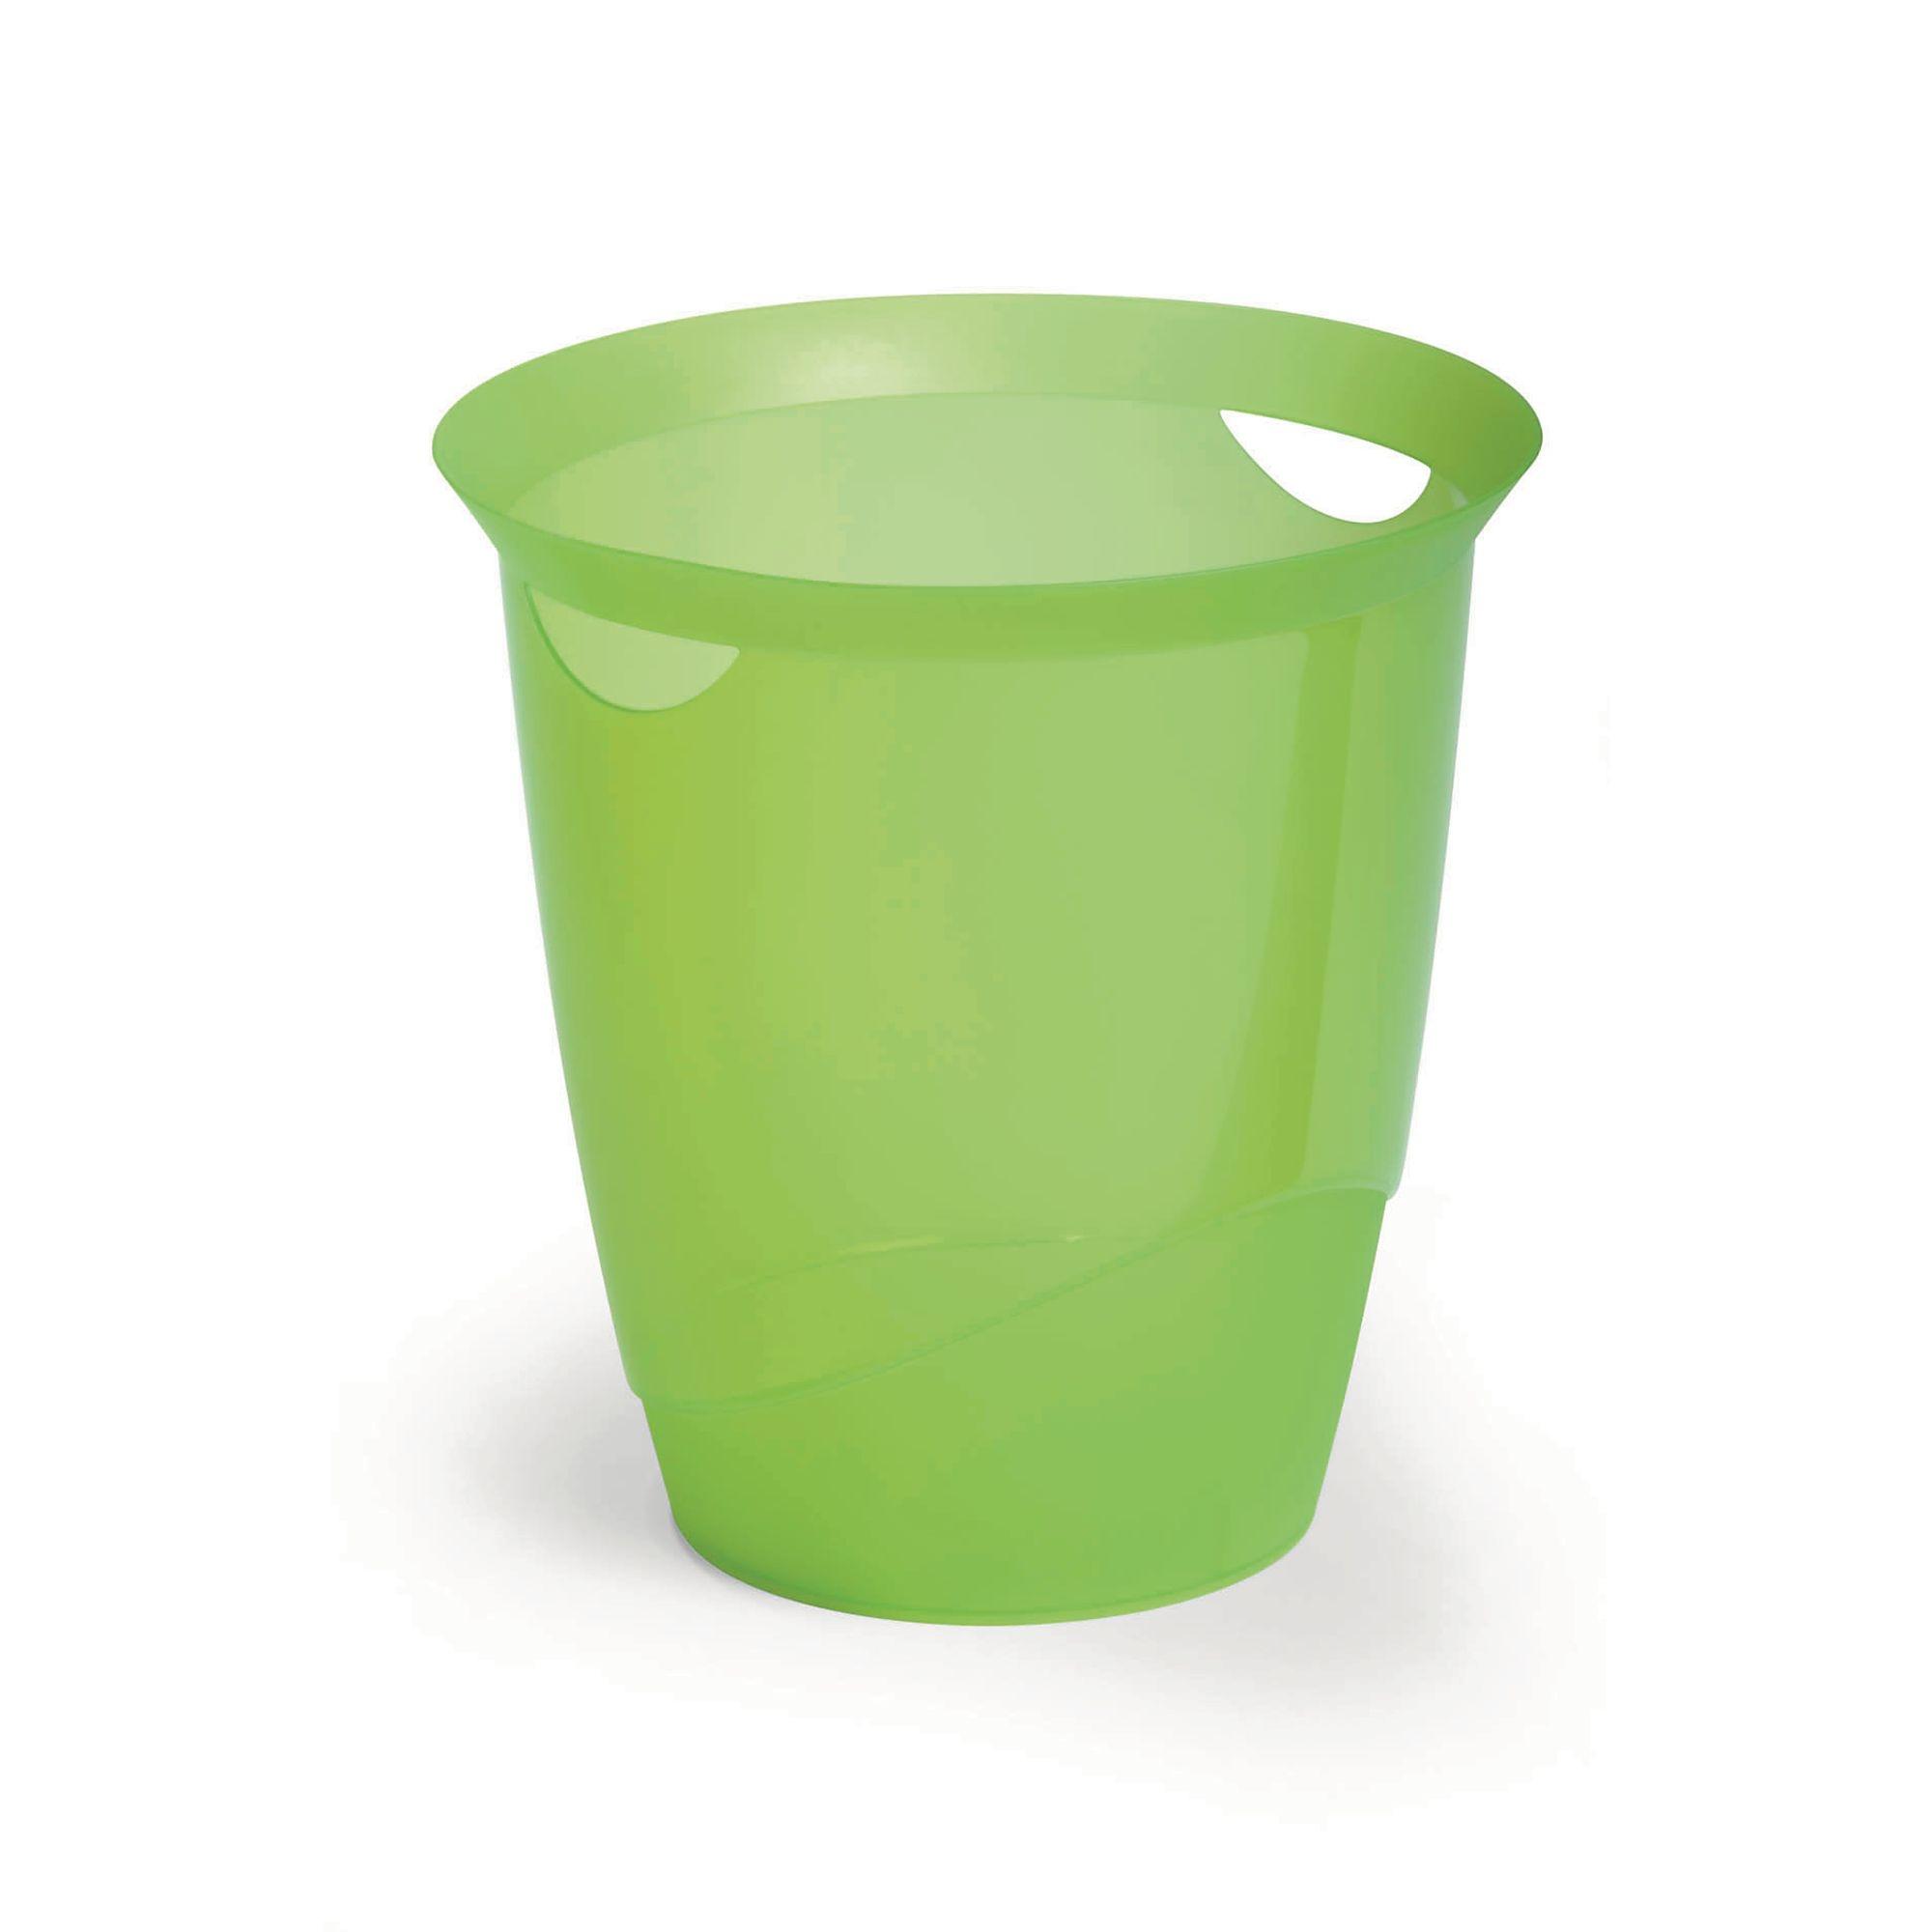 Translucent Waste Bin 16L Green